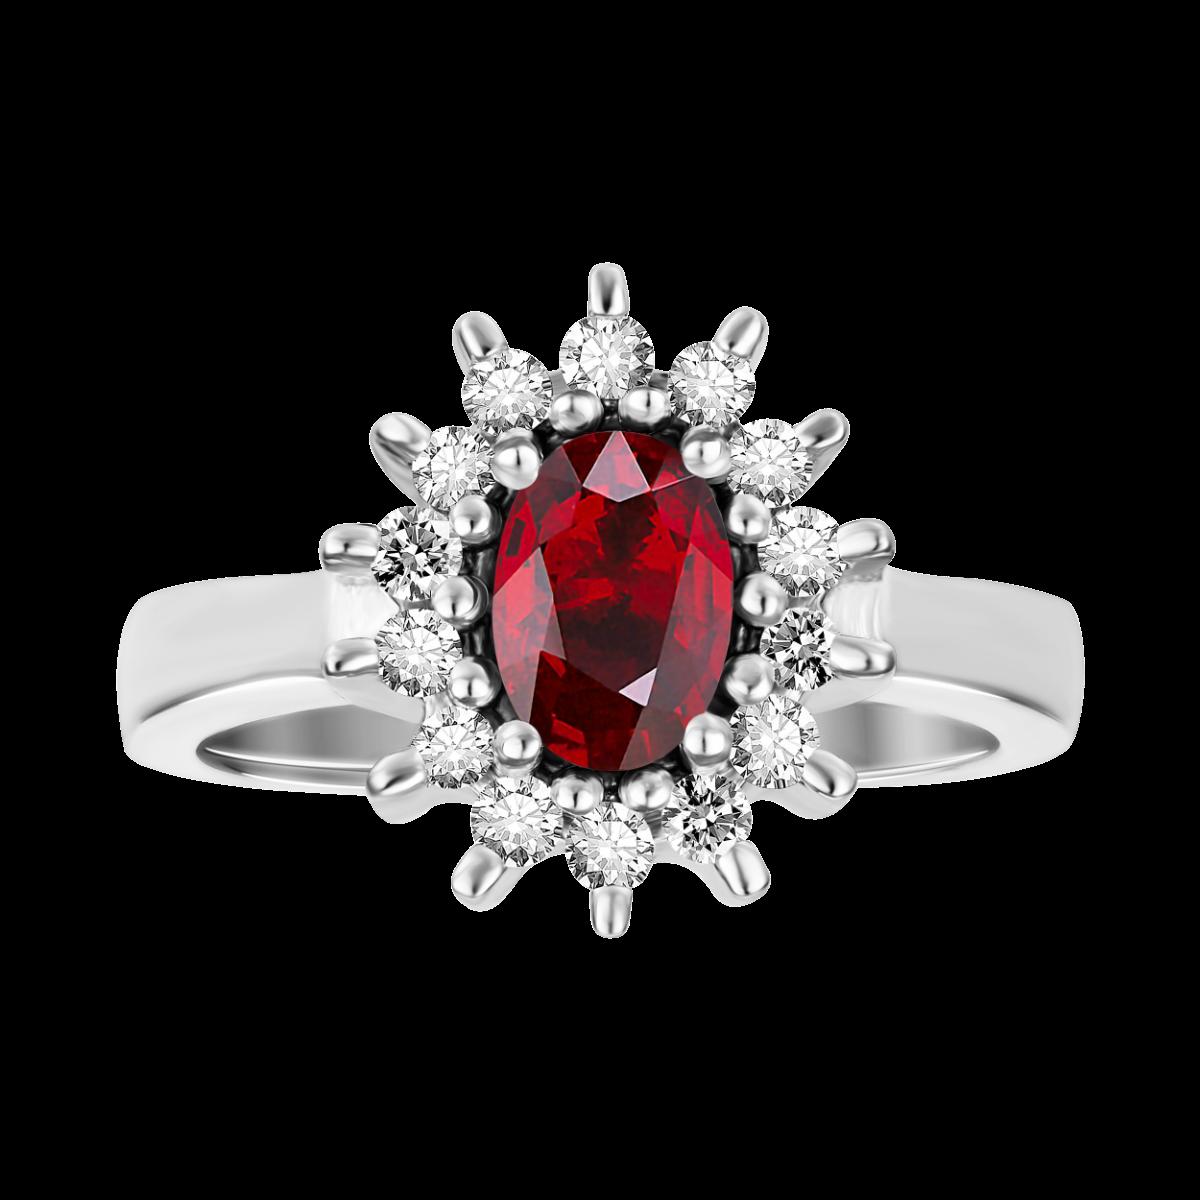 anillo rubi y  diamantes en oro blanco